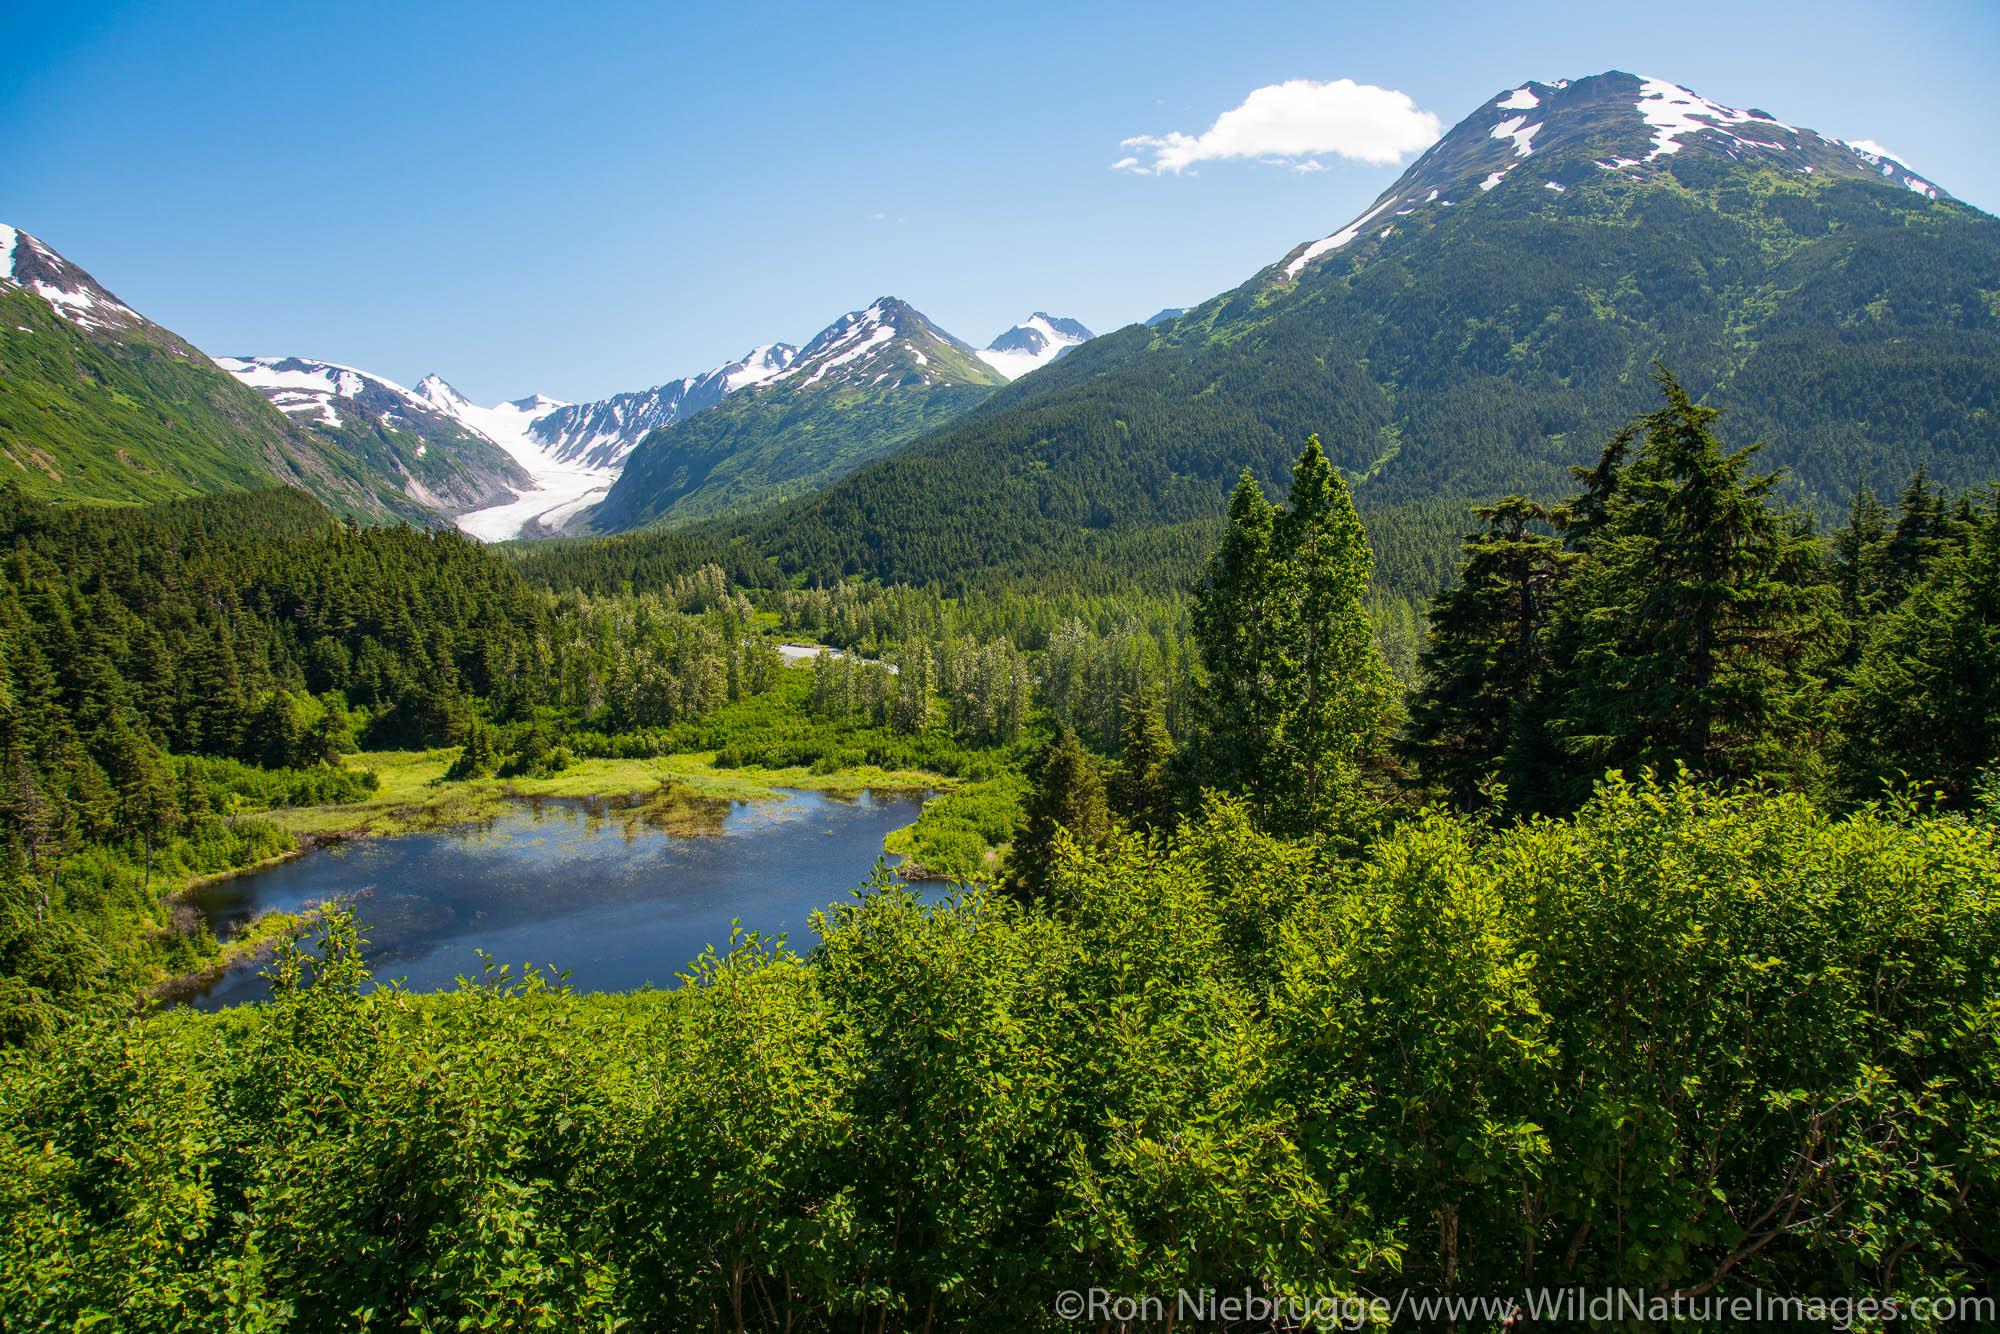 Alaska Railroad Glacier Discovery train trip,  Chugach National Forest, Alaska.